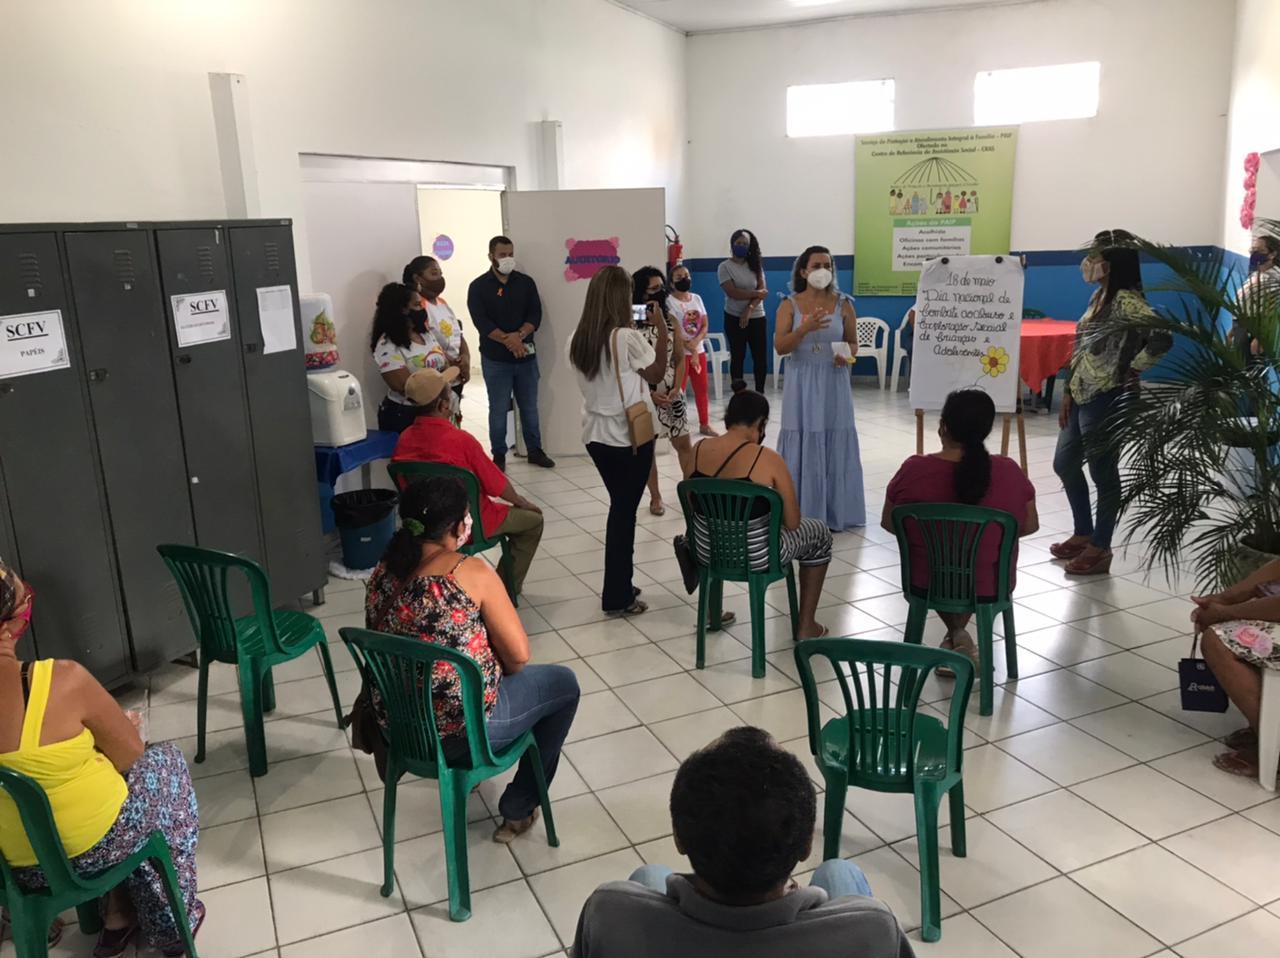 Prefeita Cordélia Torres participa de palestra sobre Maio Laranja, no CRAS I 24